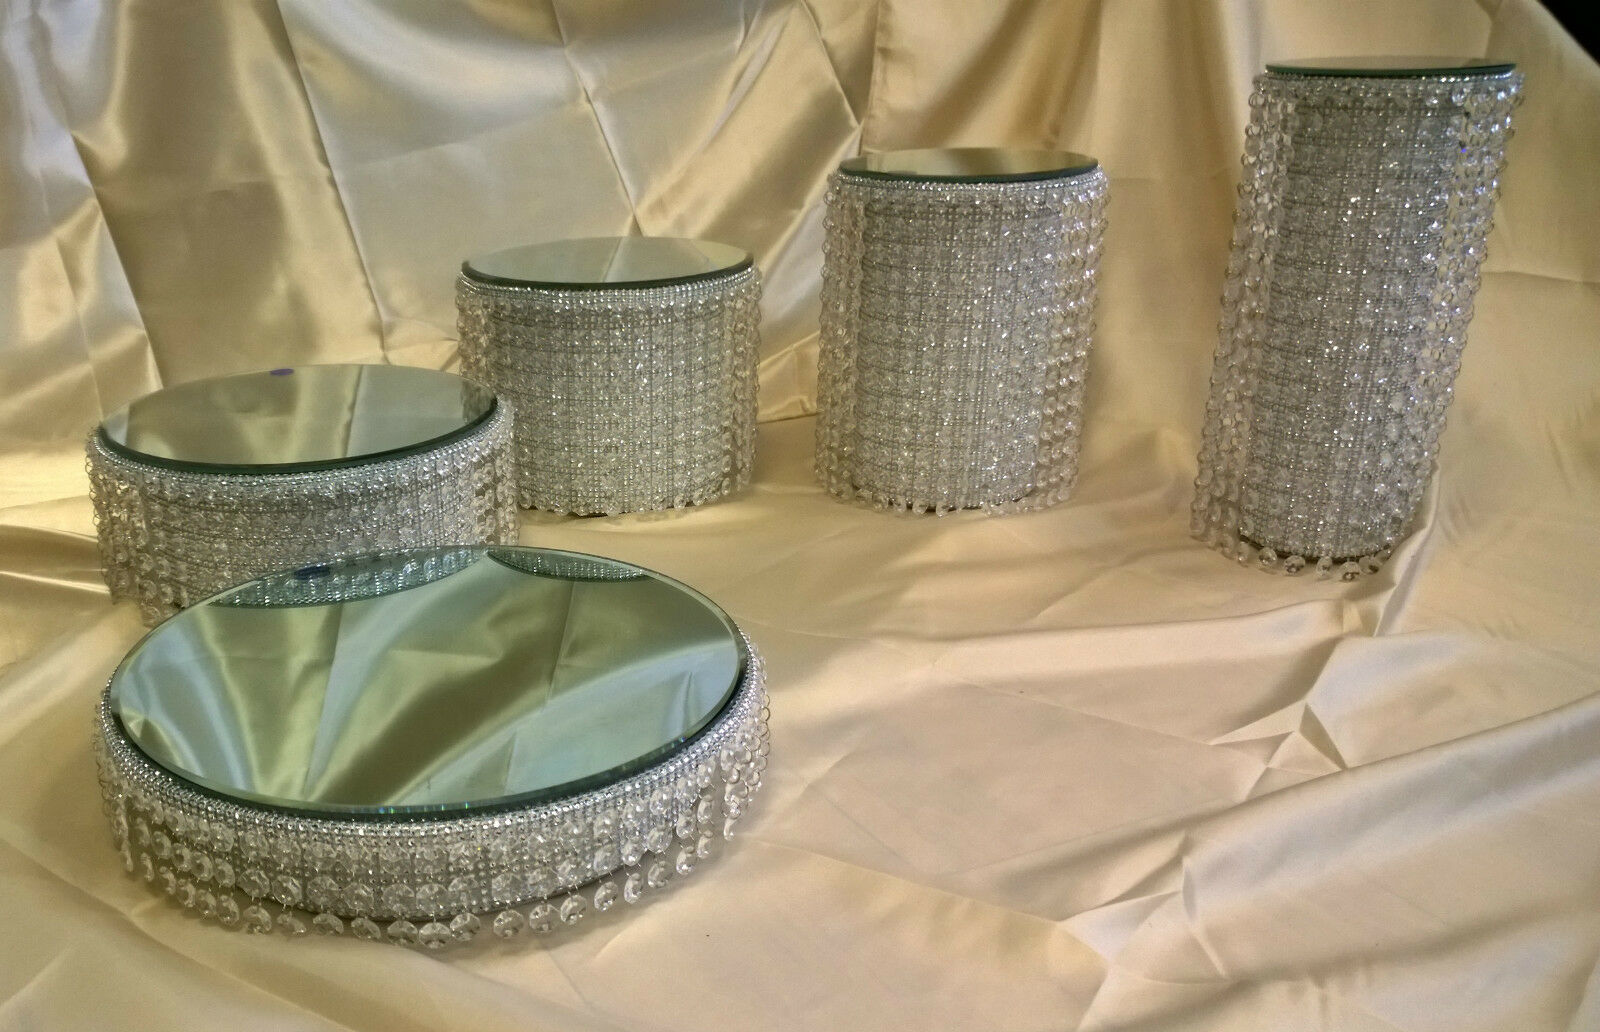 Lustre cristal strass pilier wedding cake stands 1, 2, 3, 4, 5 niveaux,